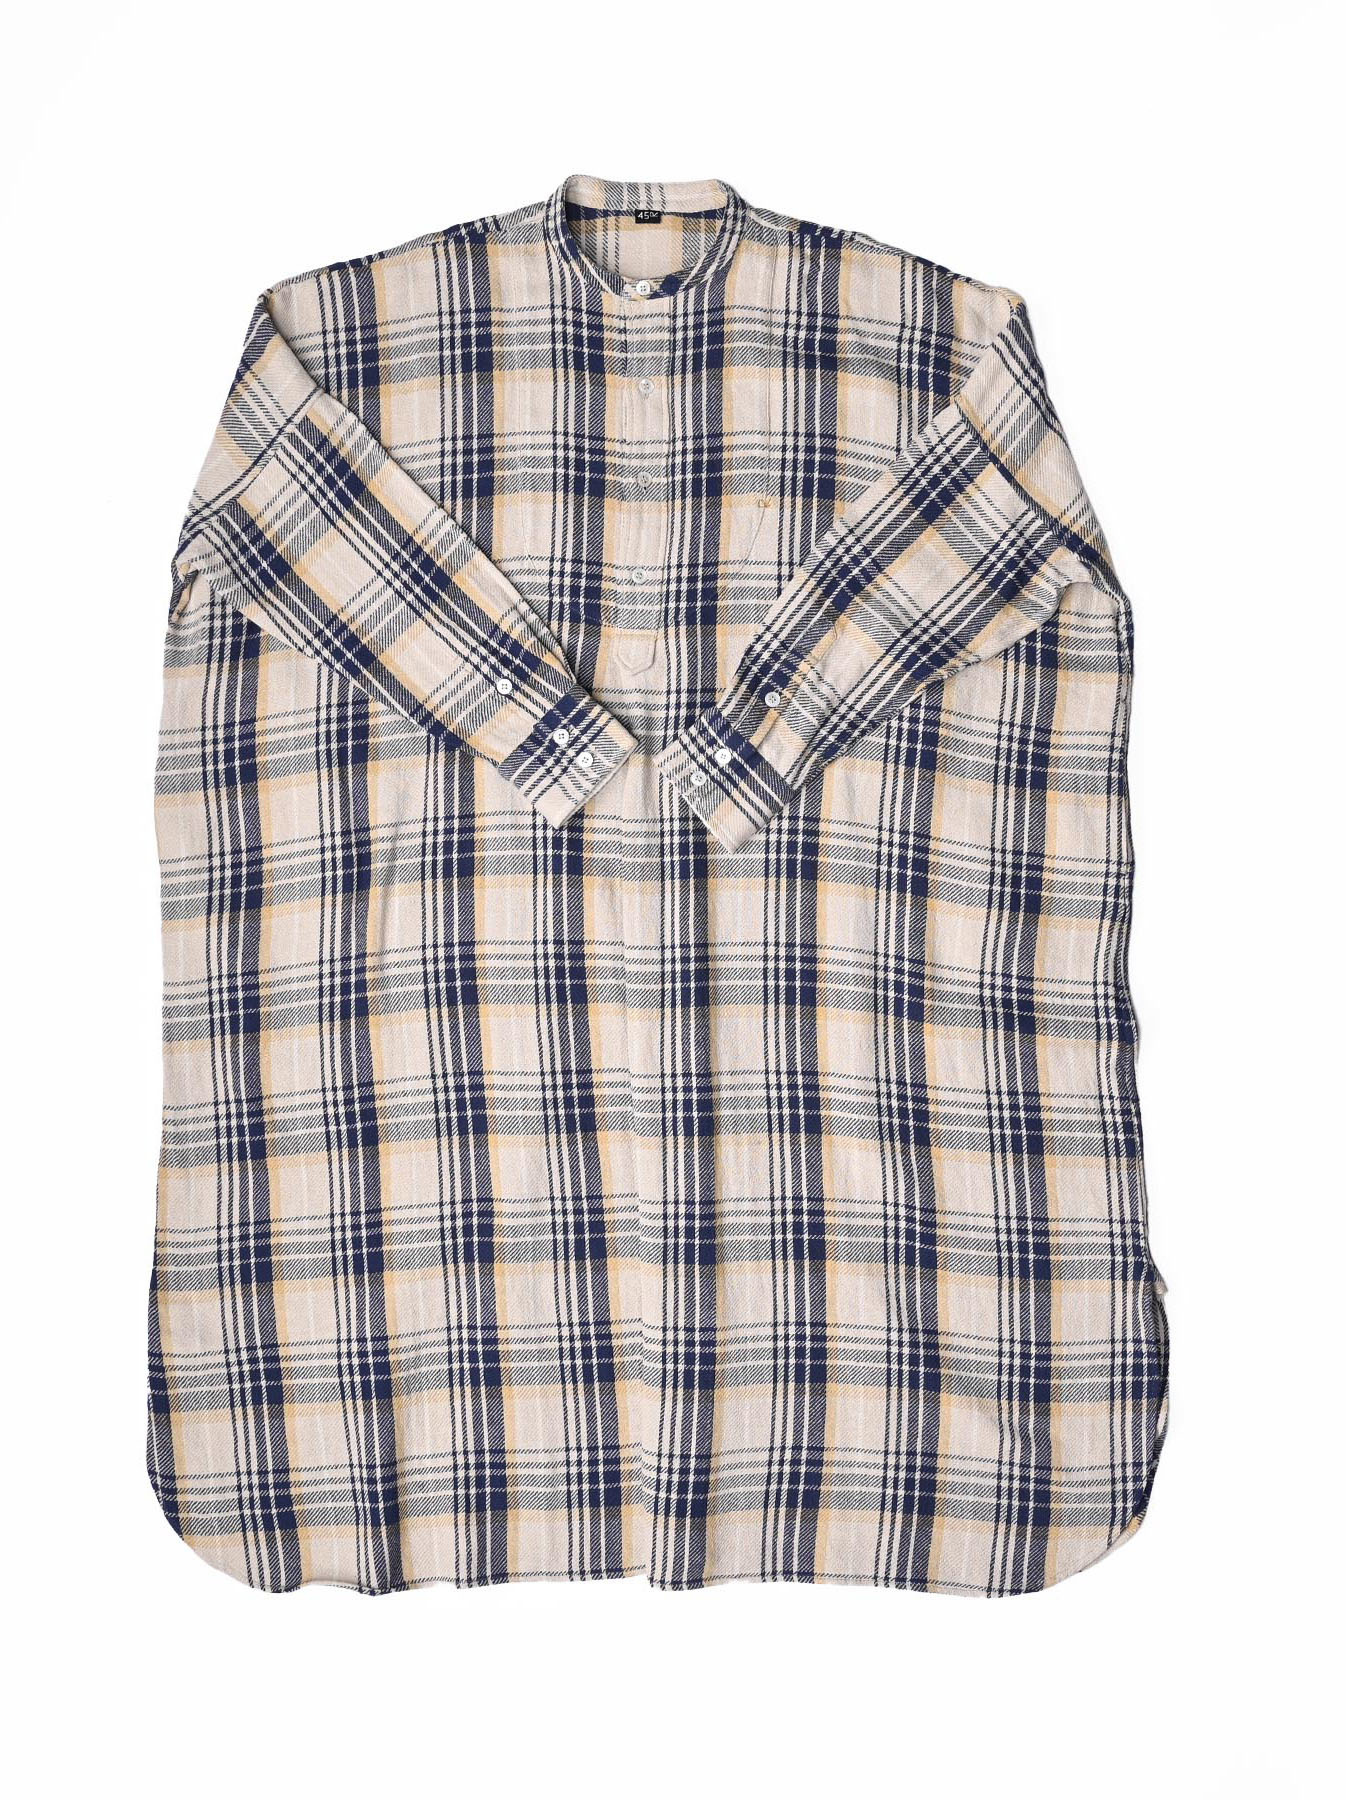 Indian Flannel Big Shirt-dress-5